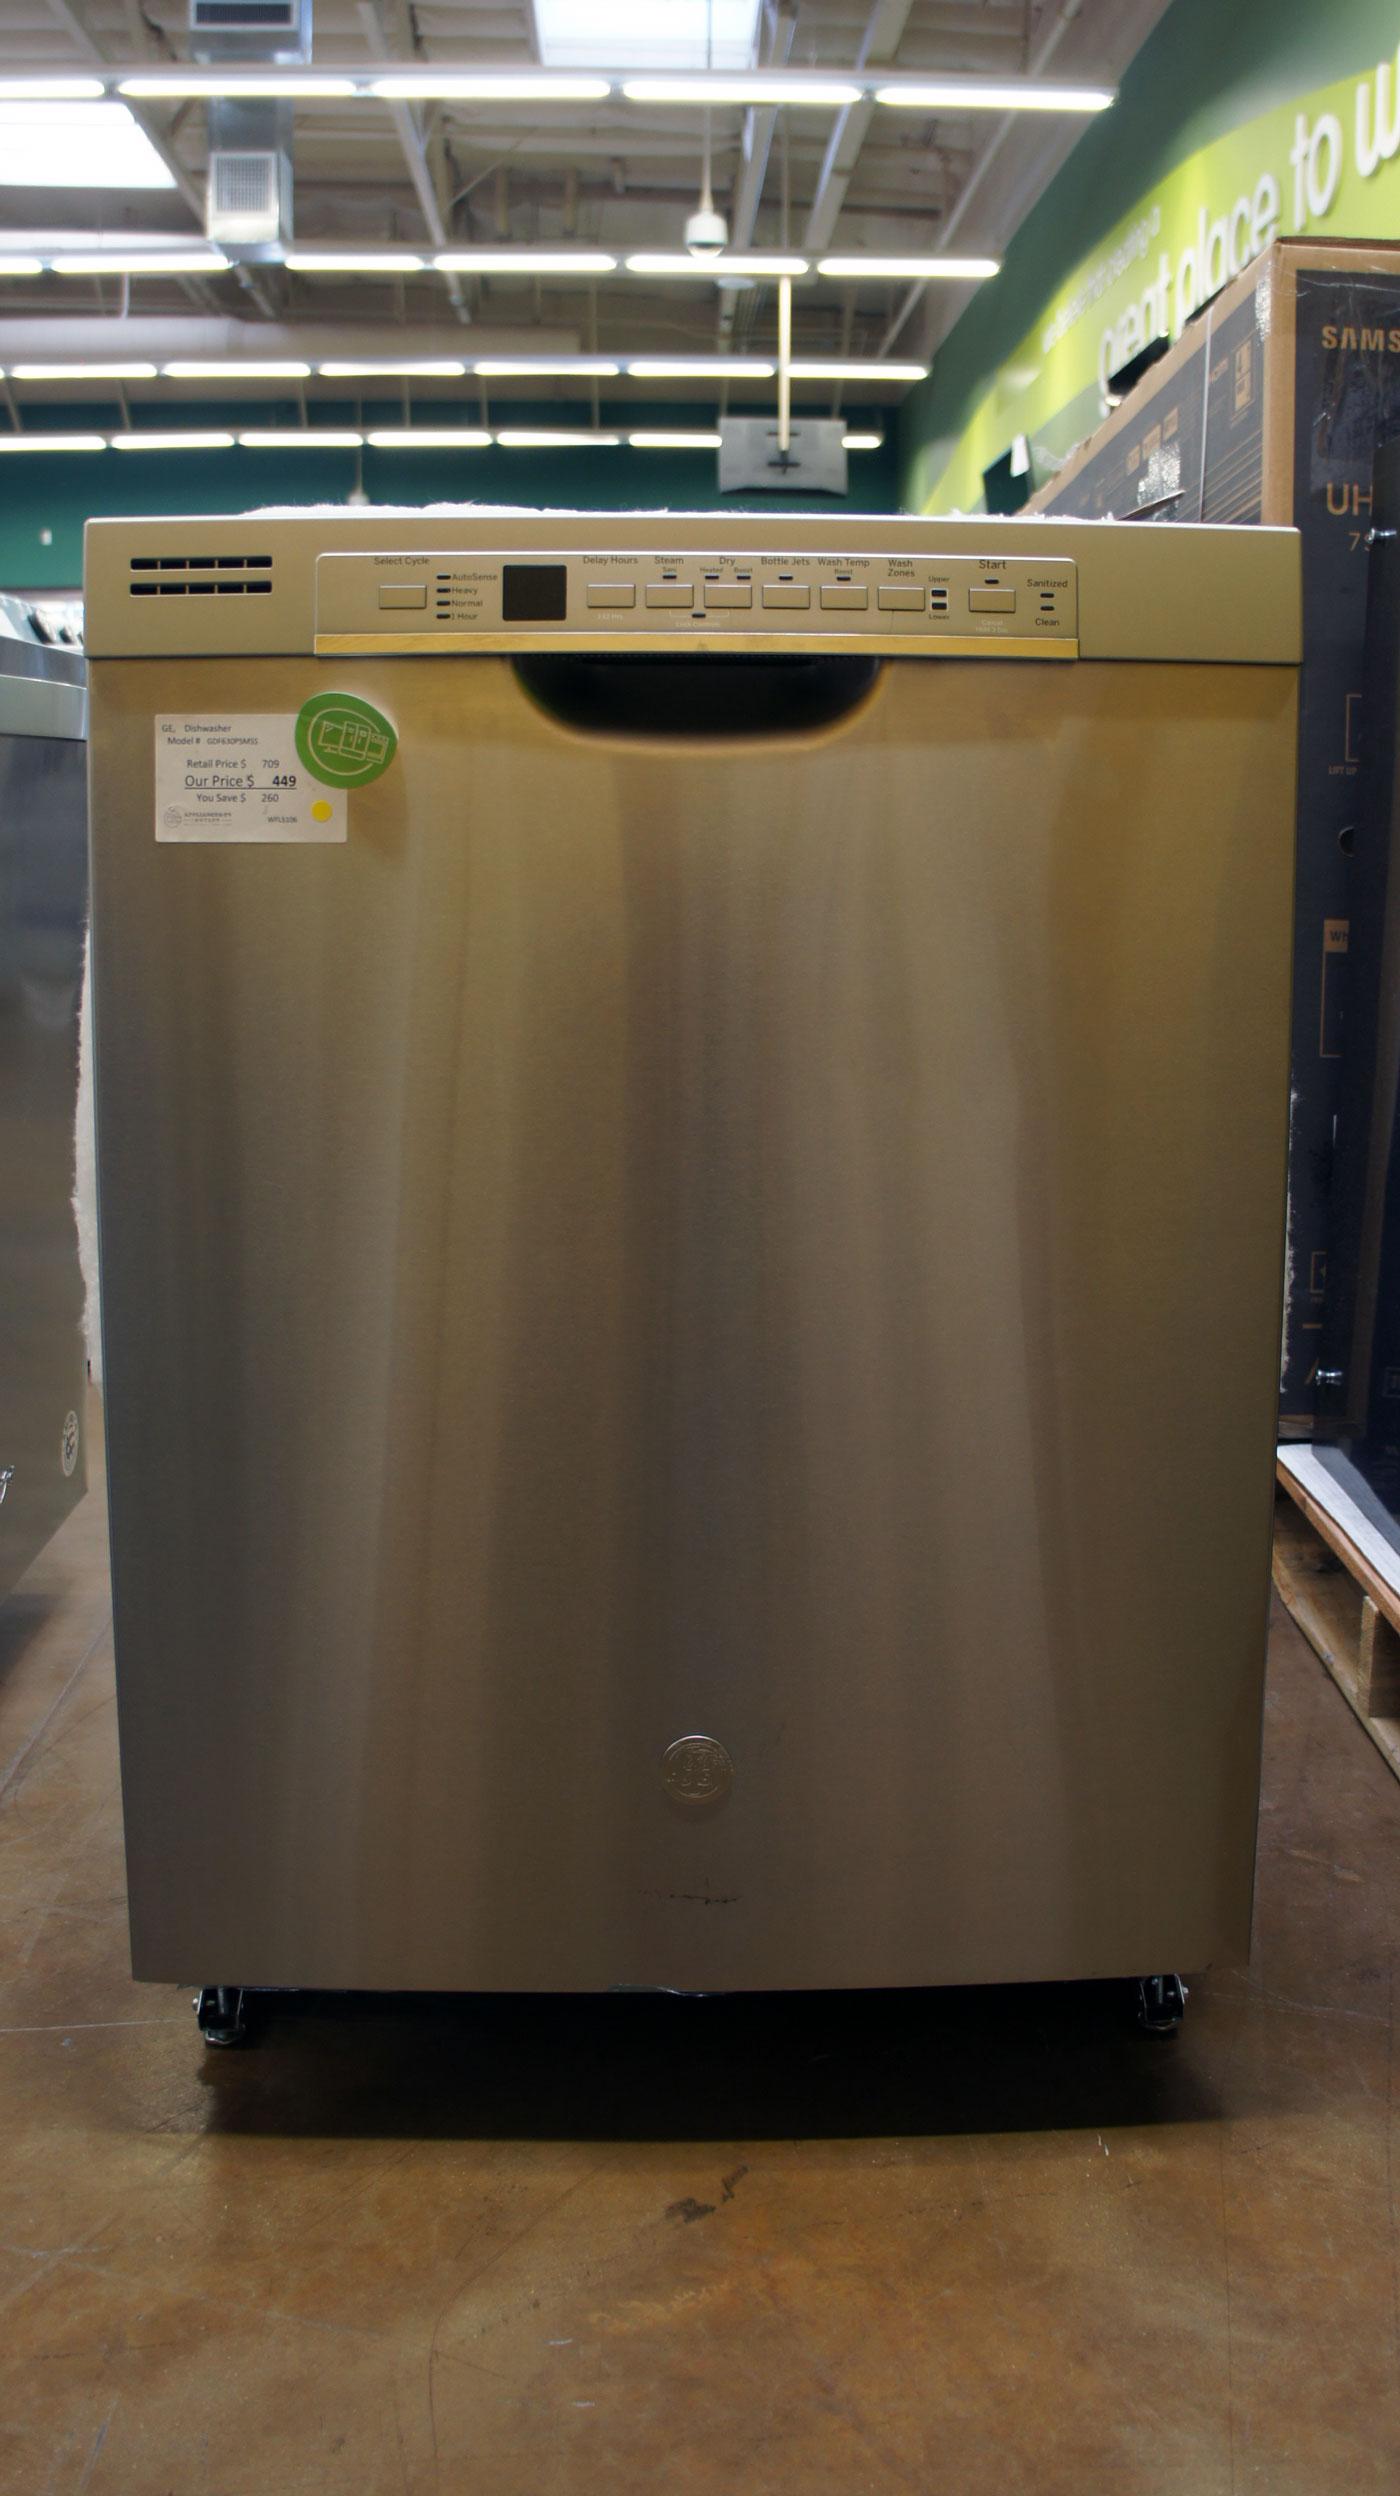 "24"" GE GDF630PSMSS Dishwasher"